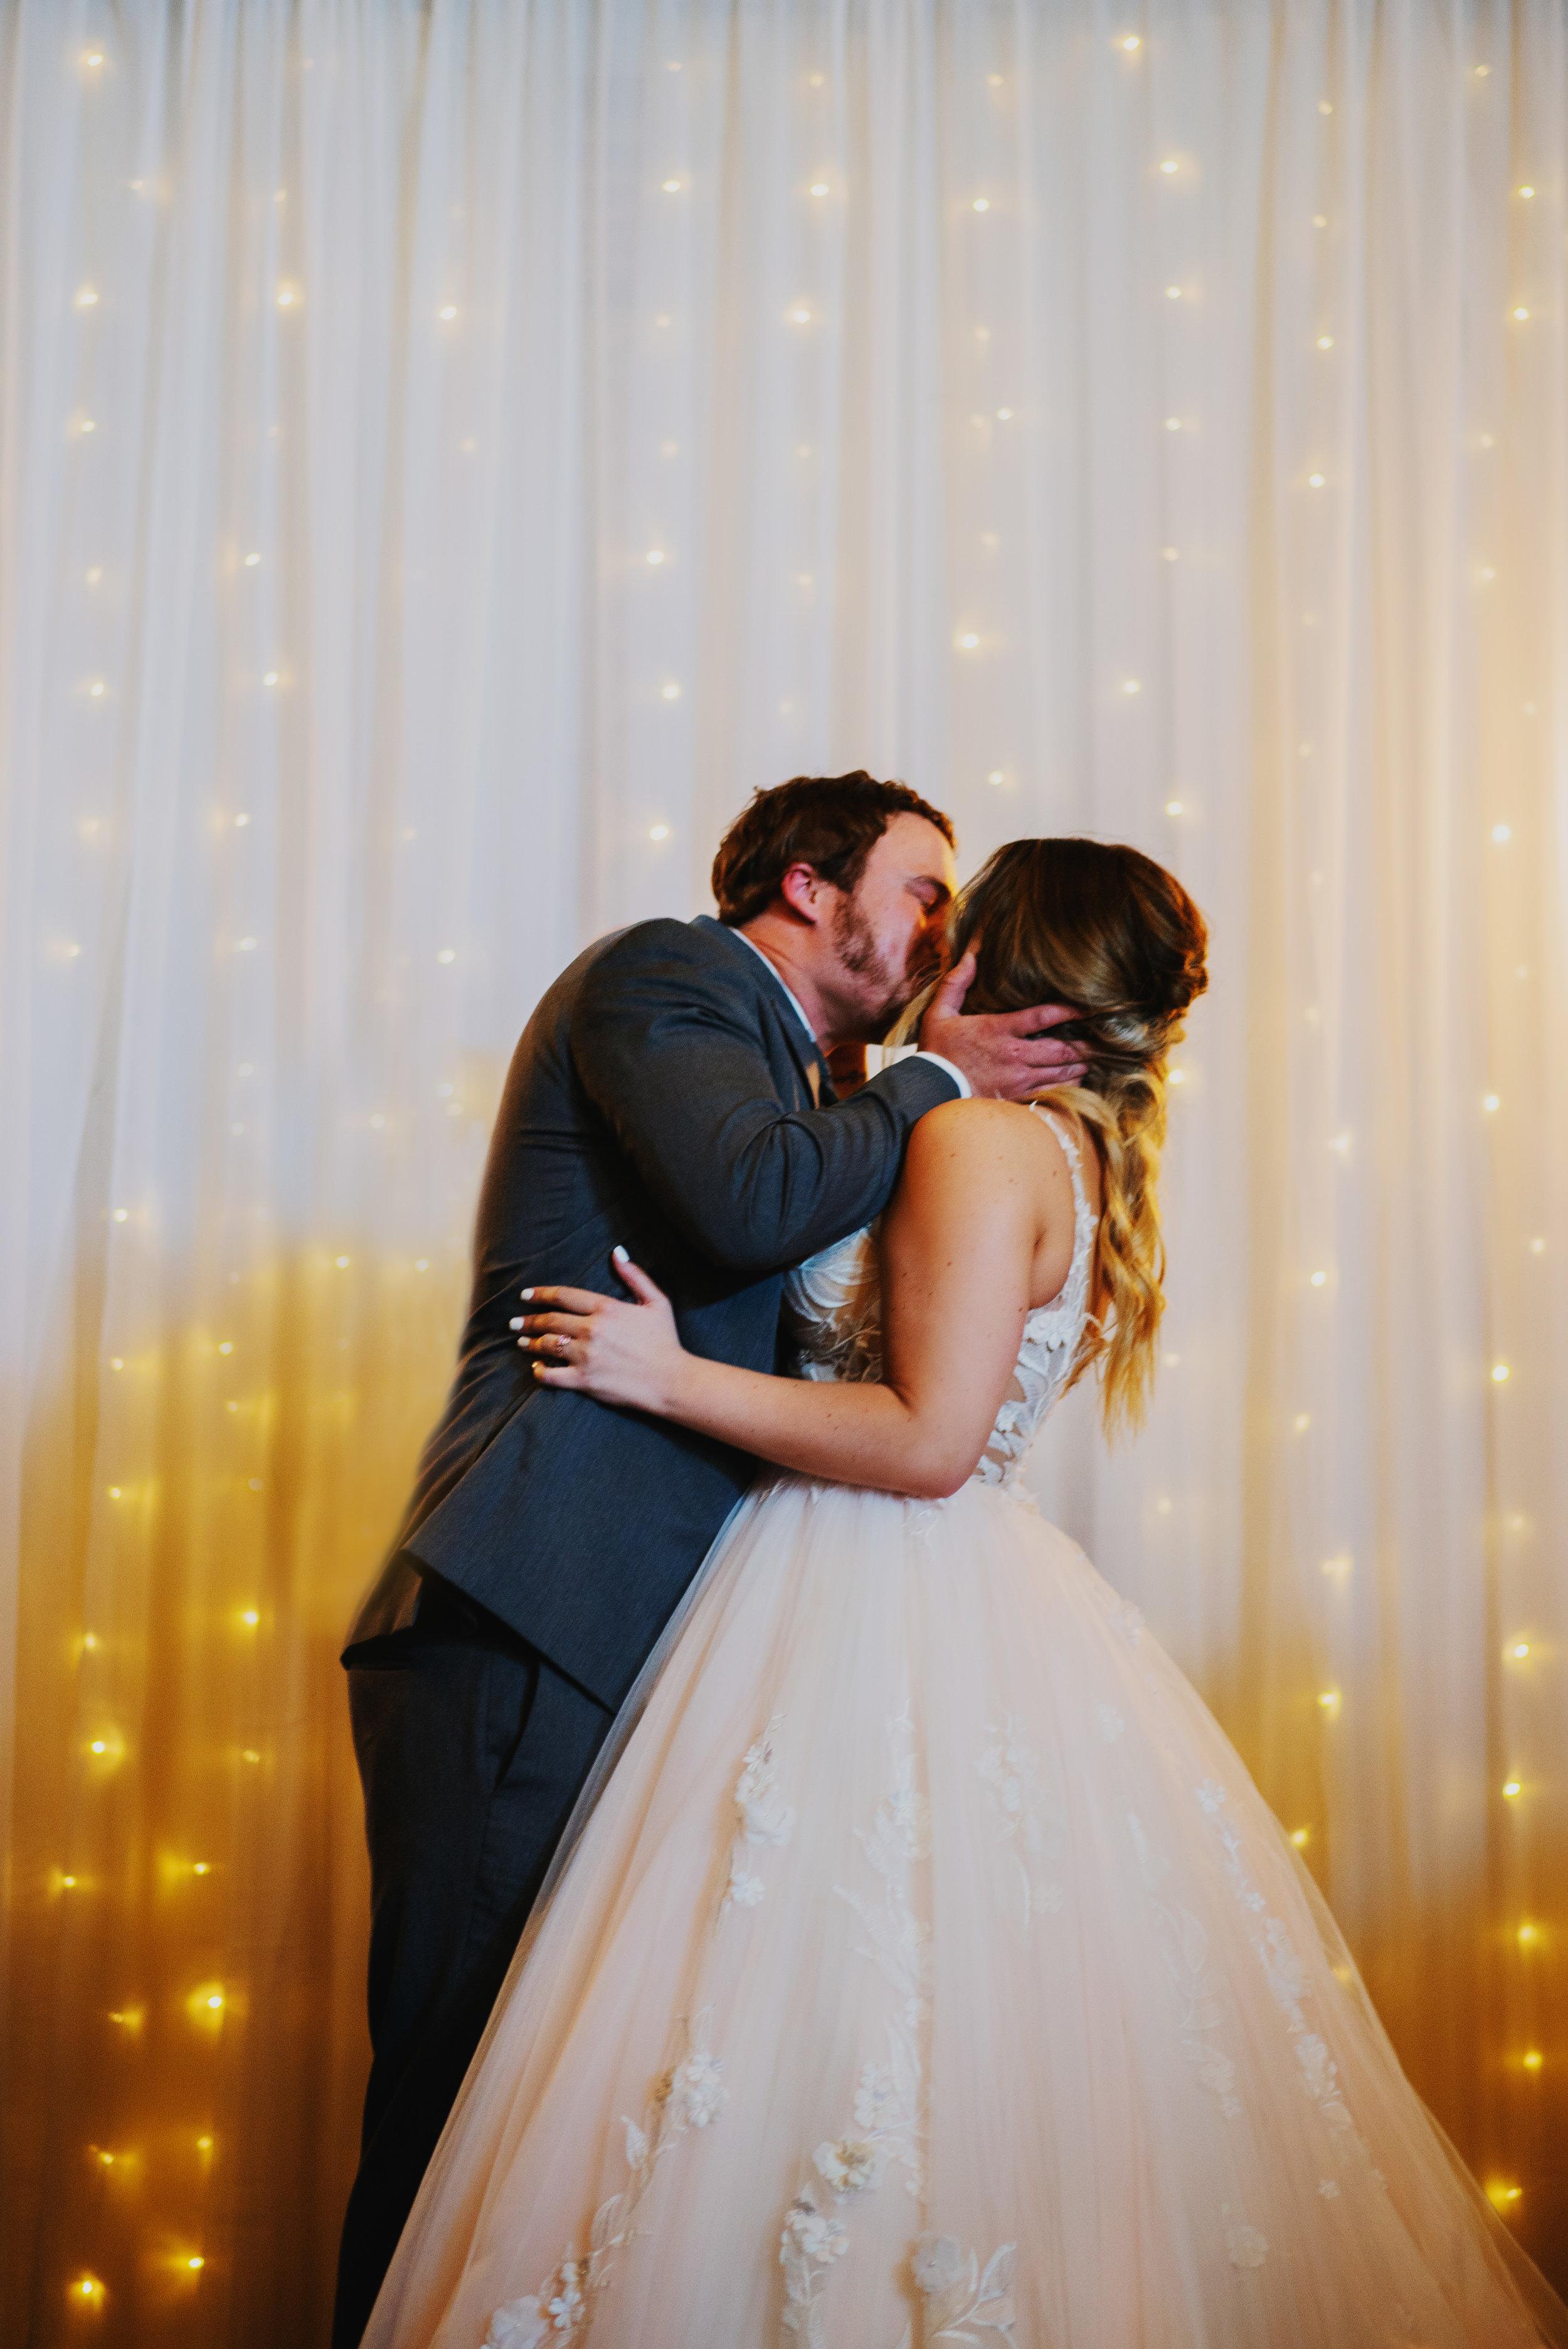 Benckendor-TheSilverFox-Streator-Wedding_0180.jpg